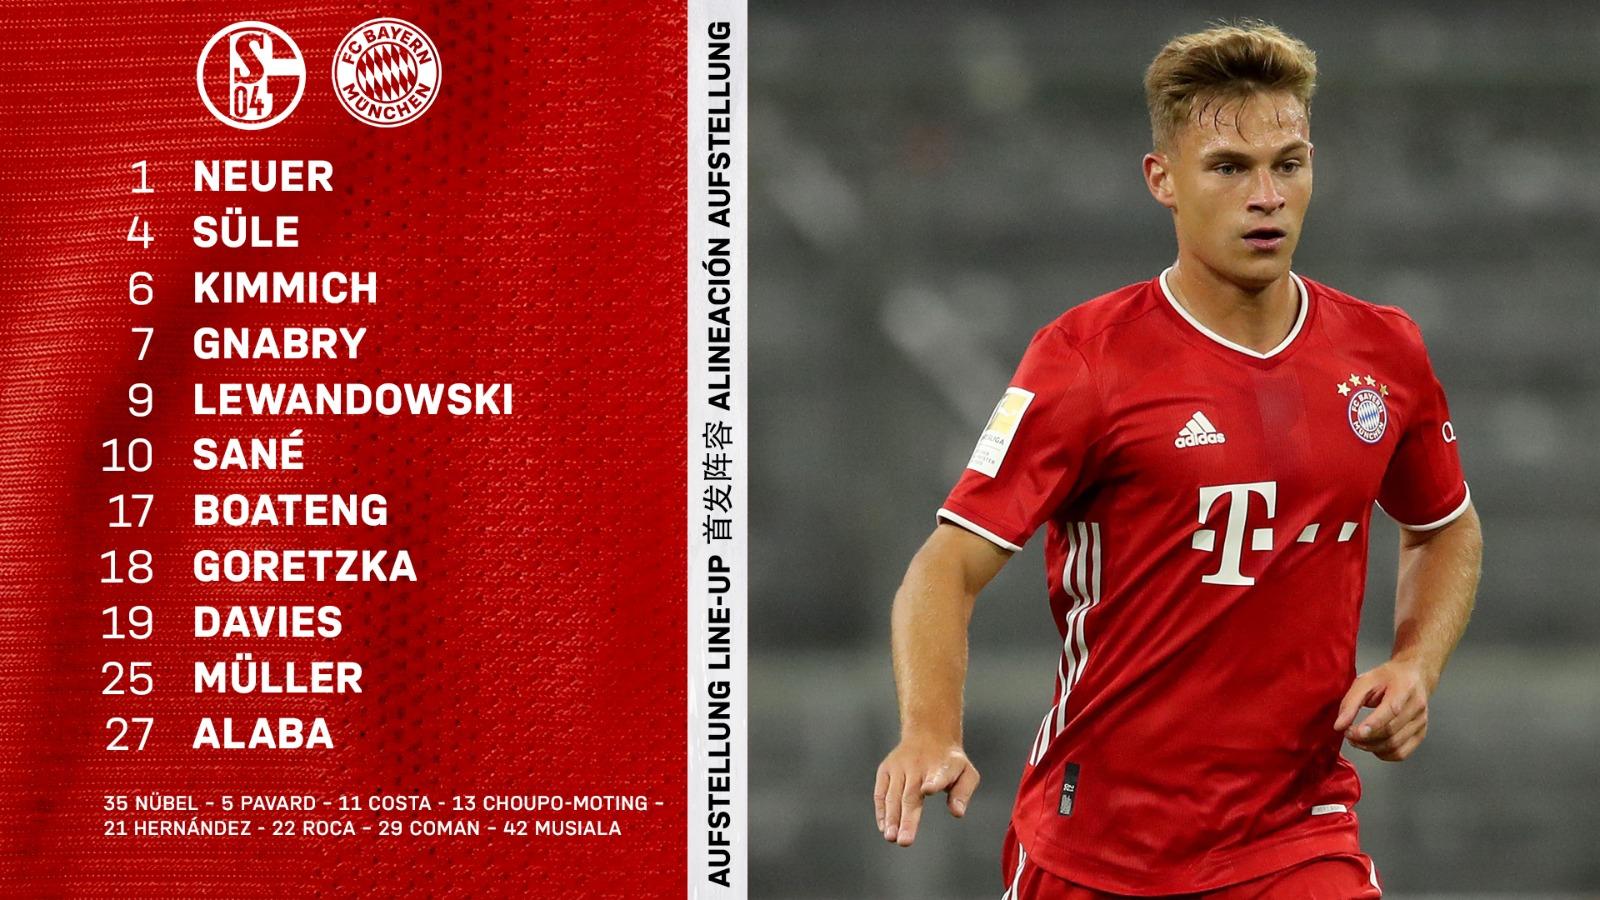 The Bundesliga Thread 20/21  - Page 13 EsgAmTTXMAA_tV4?format=jpg&name=large